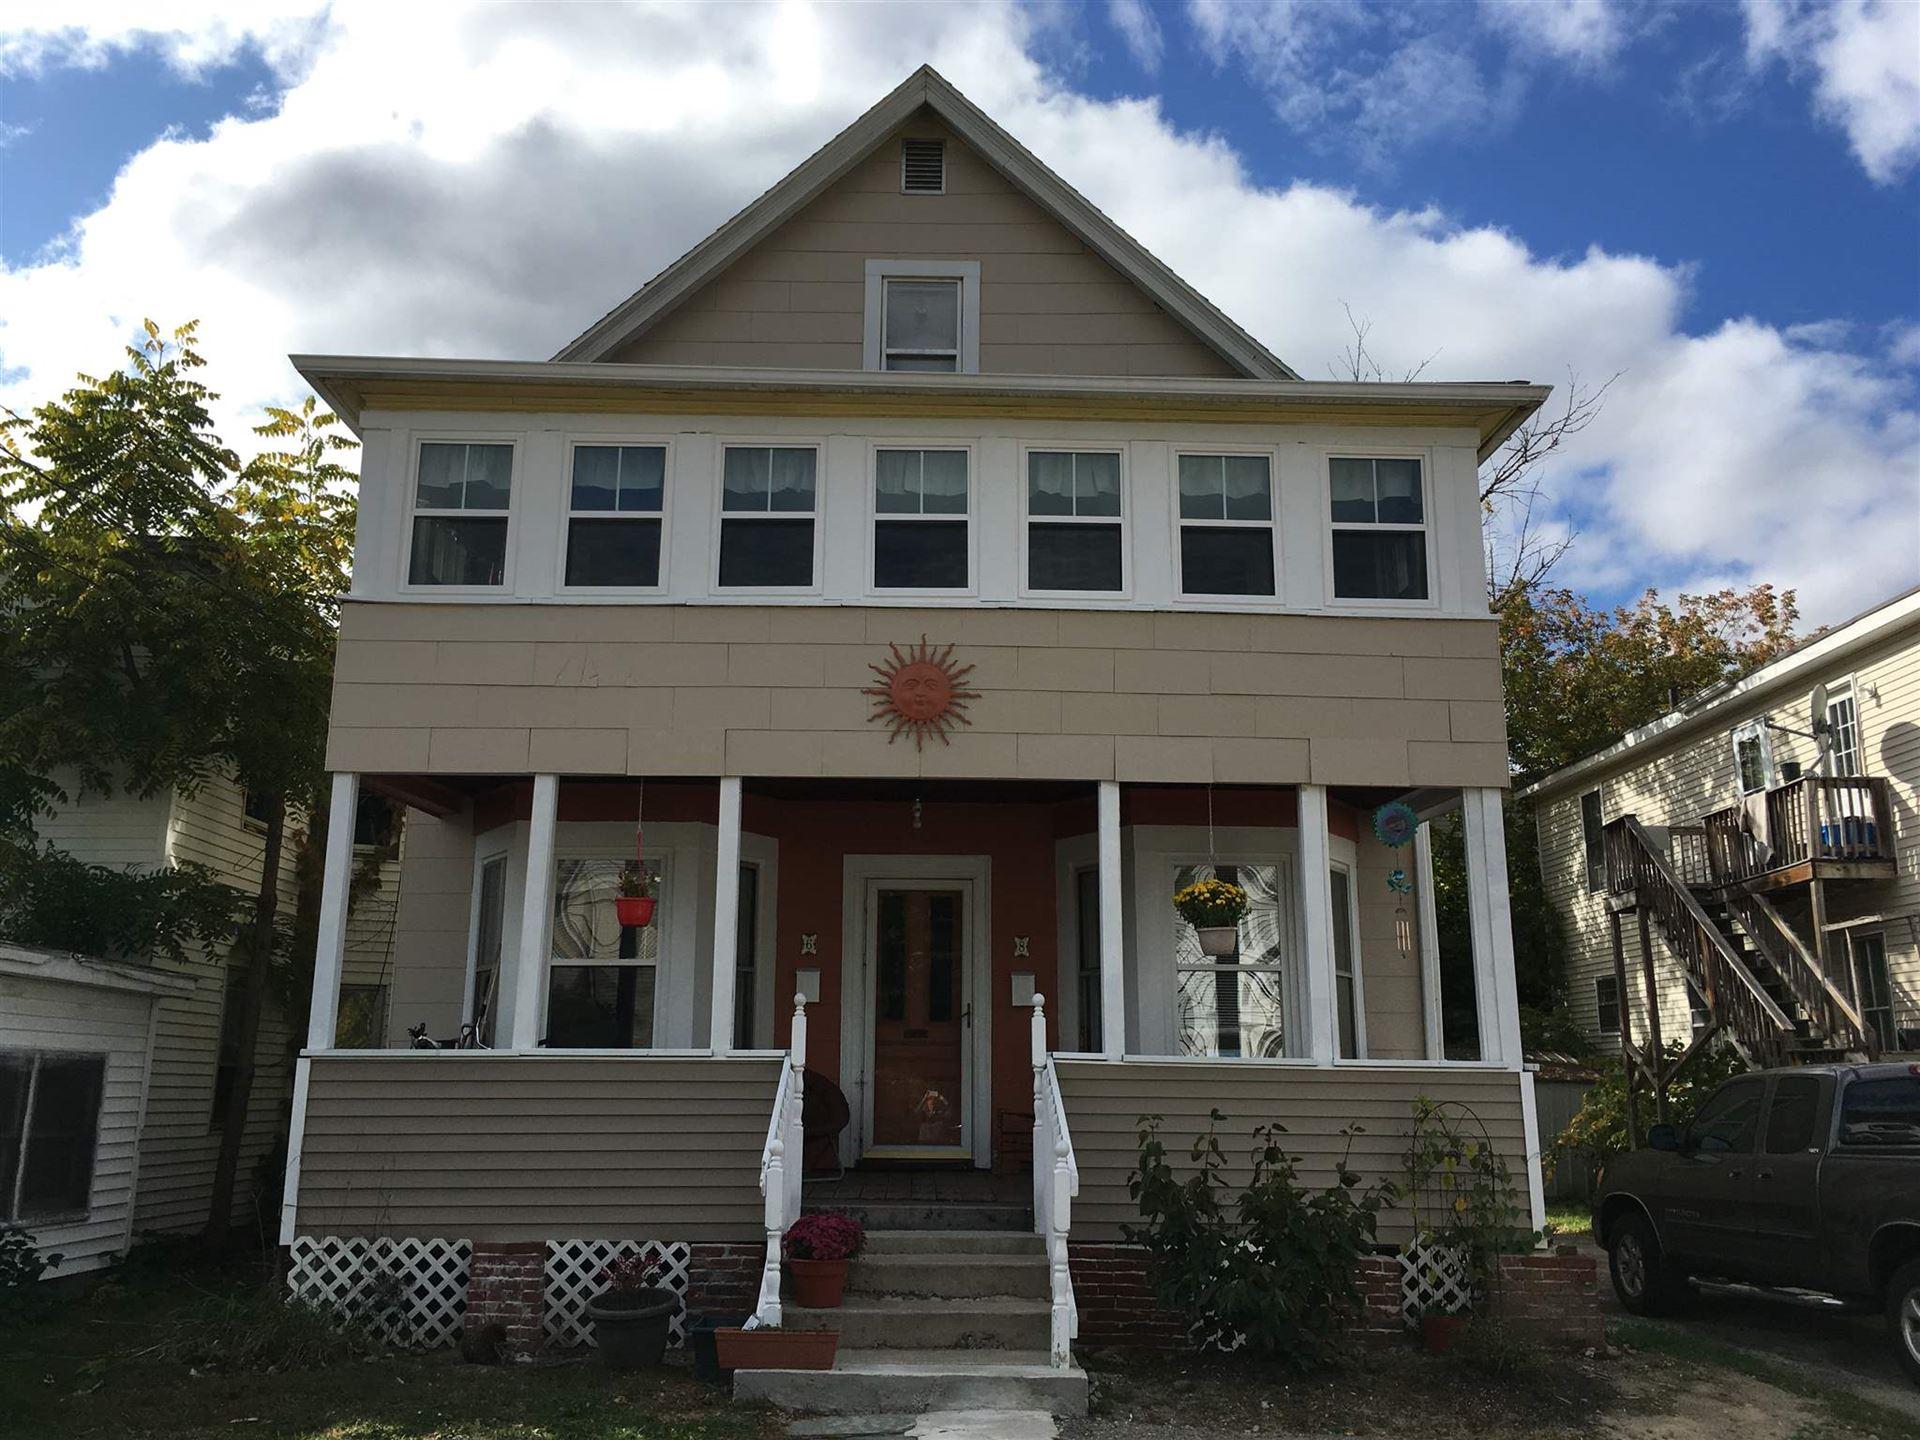 6-8 East Street, Dover, NH 03820 - MLS#: 4828475